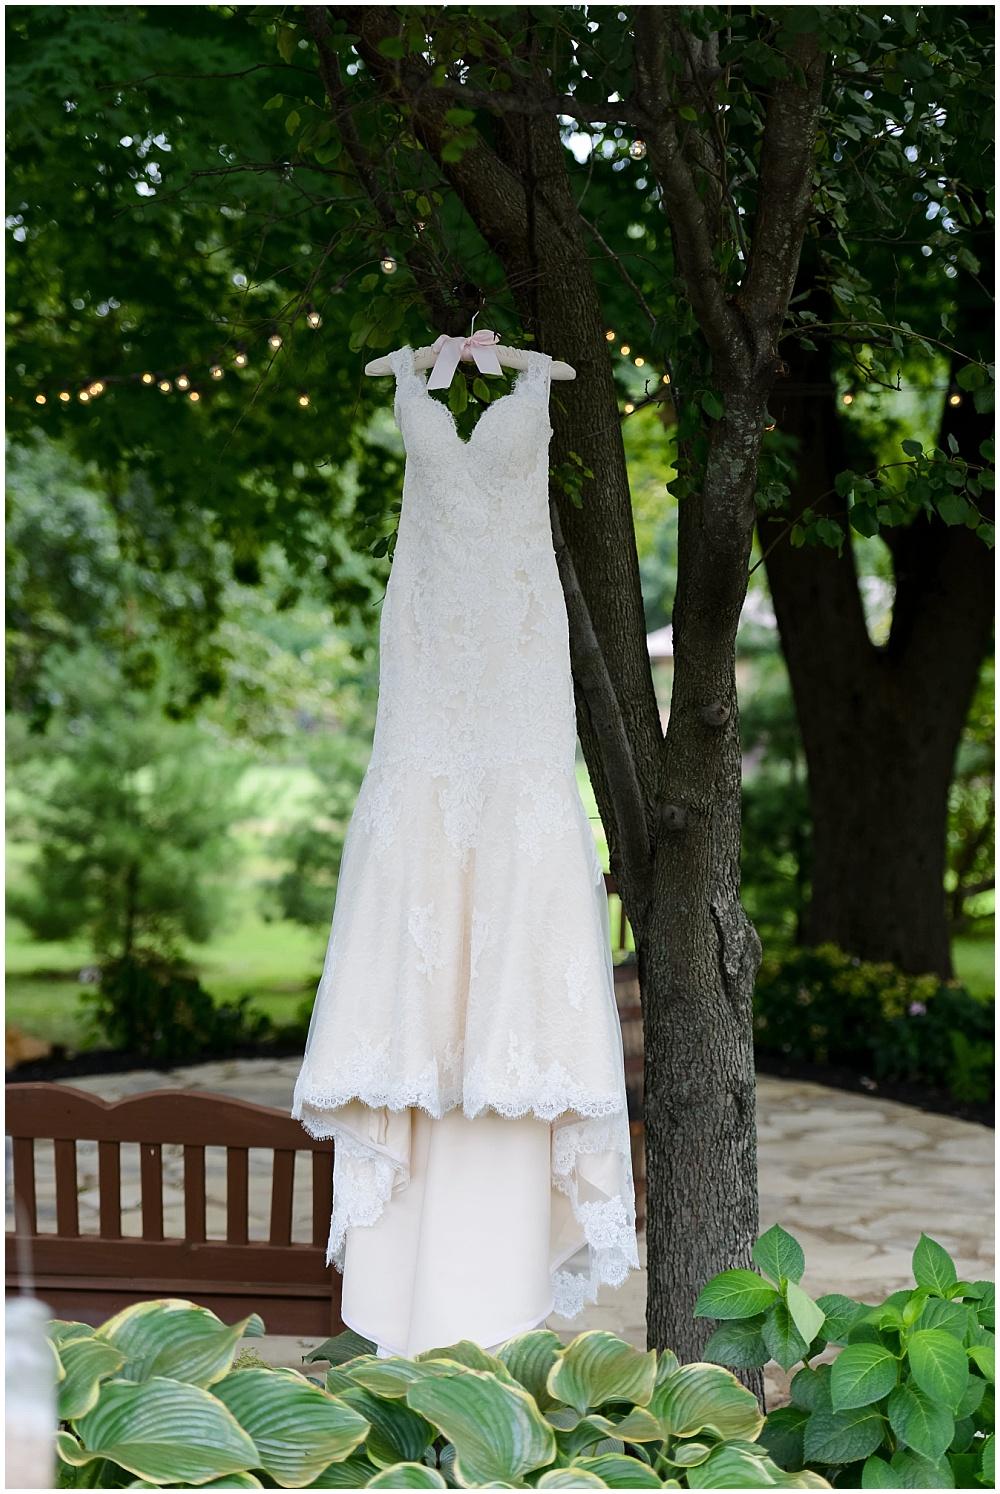 Lace wedding dress hanging from tree | Mustard Seed Gardens Wedding by Sara Ackermann Photography & Jessica Dum Wedding Coordination